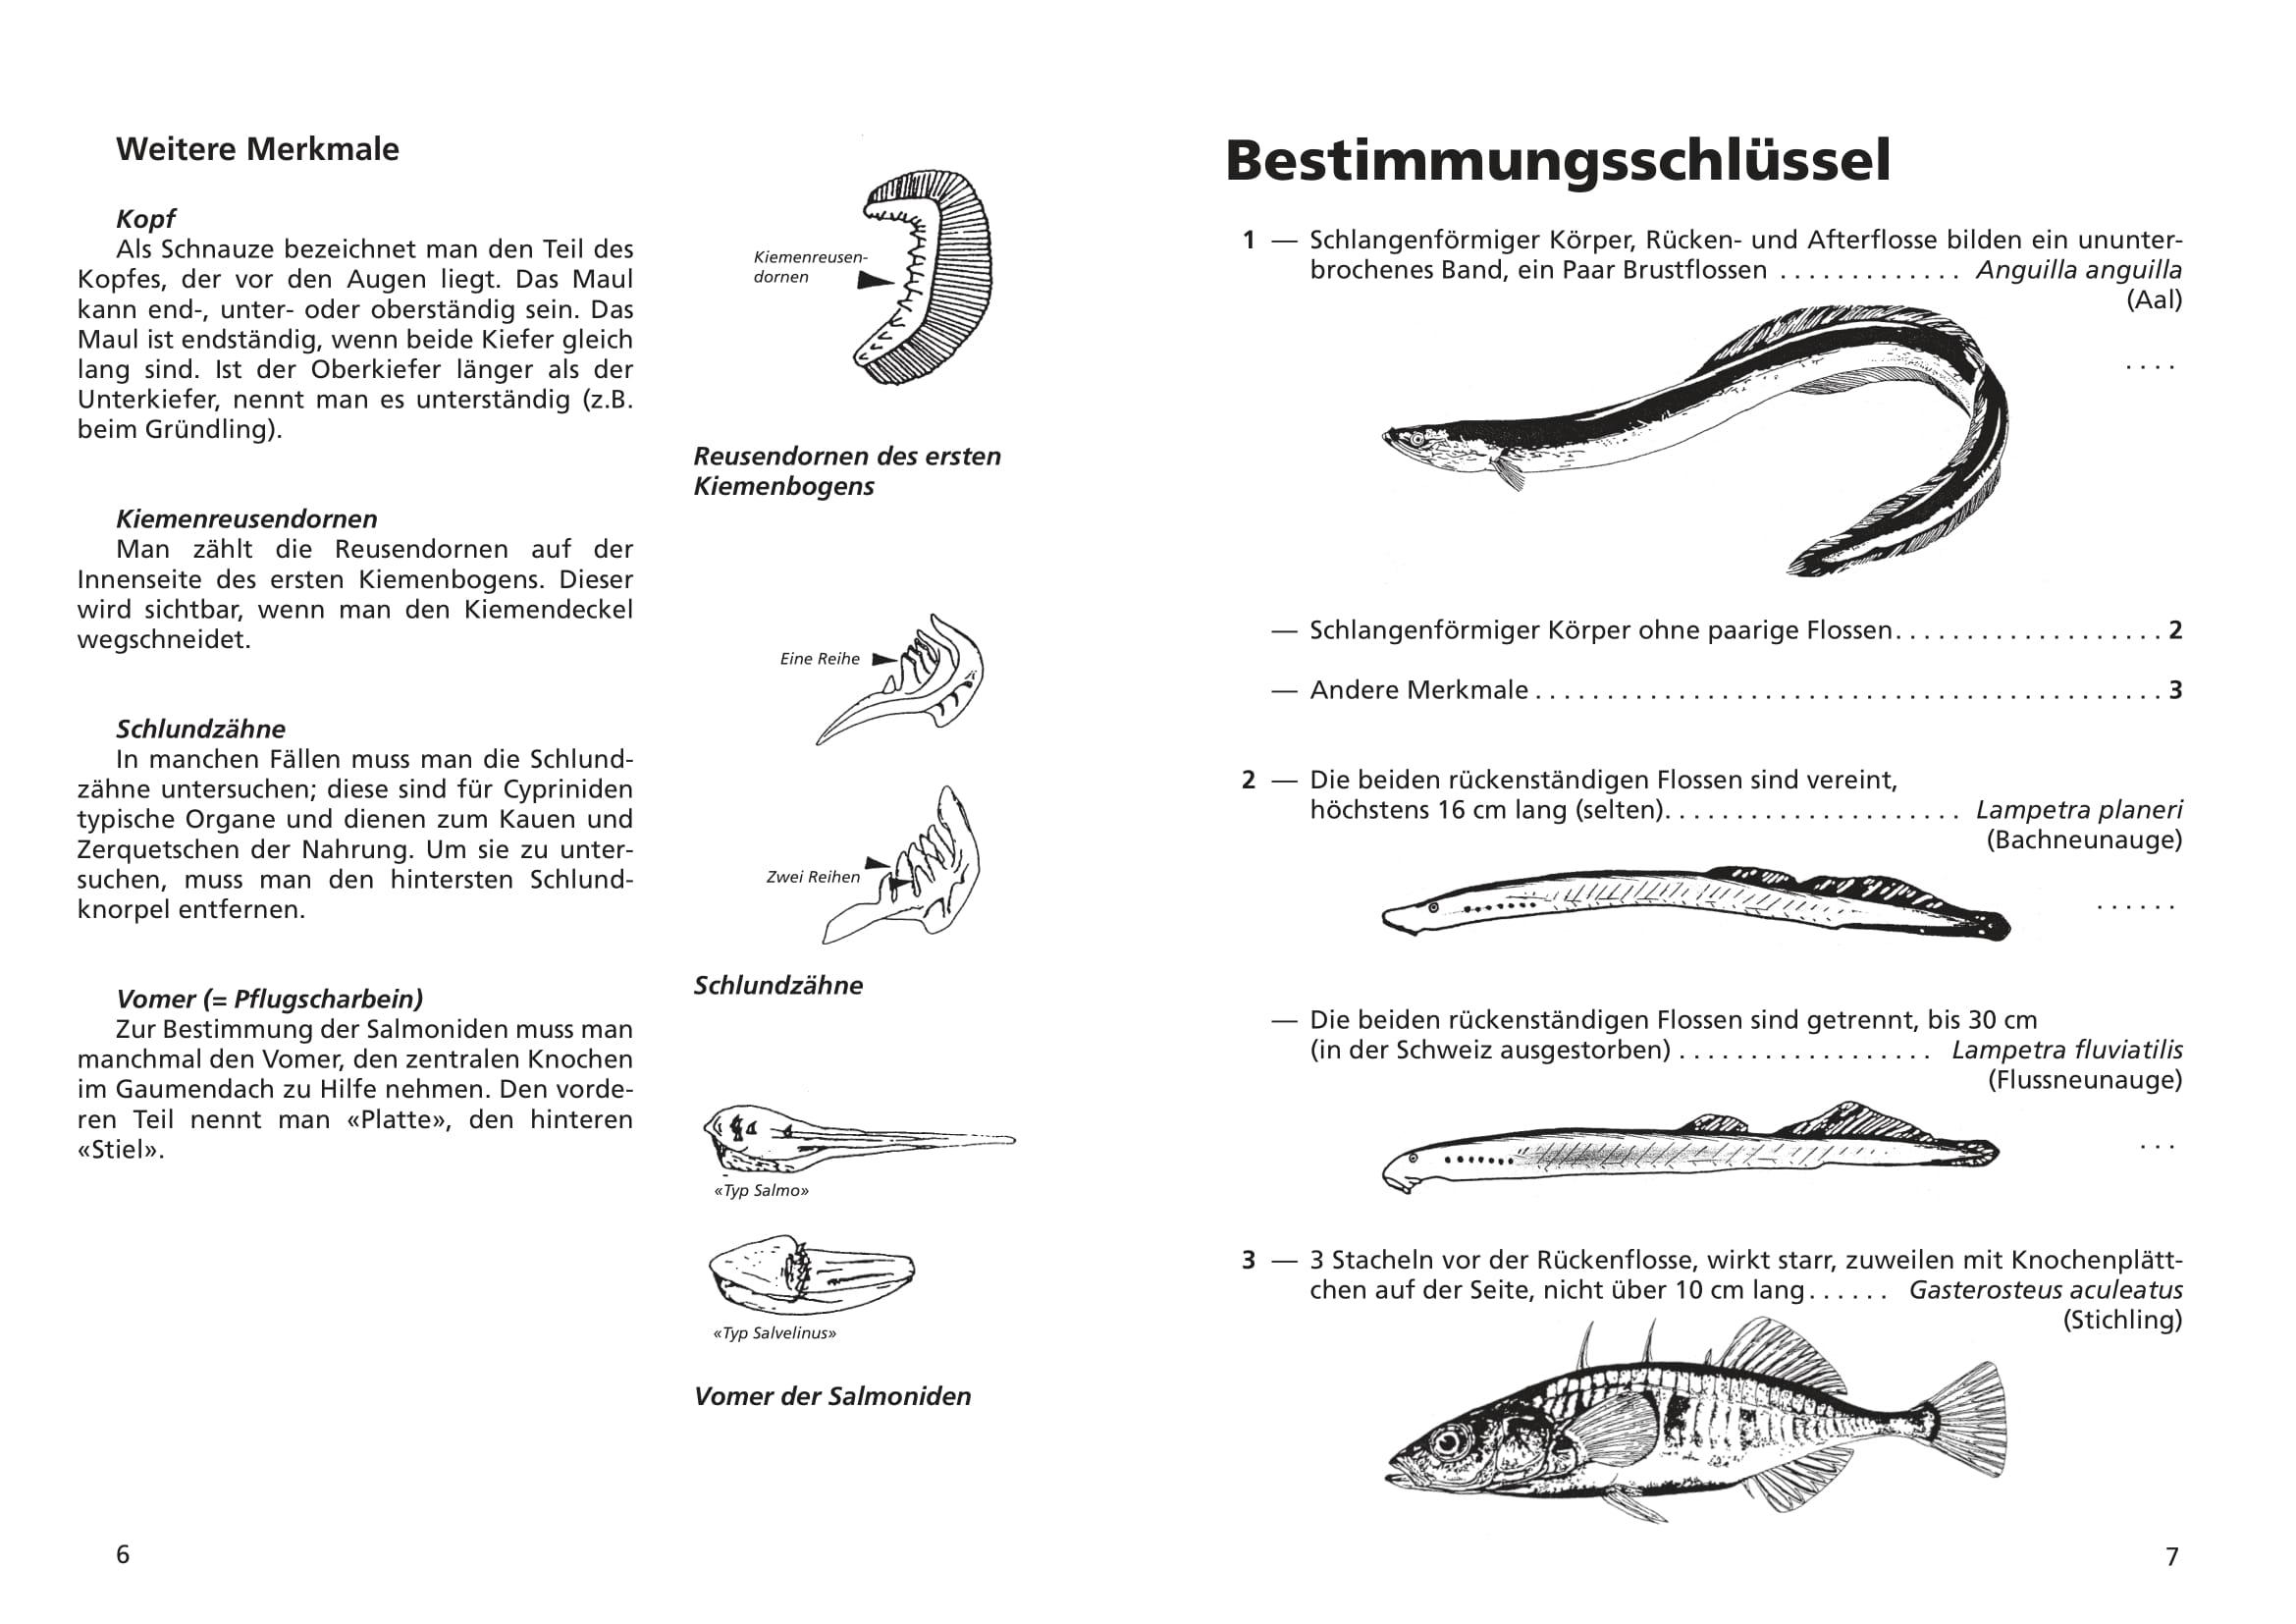 merkblatt_8_suesswasserfische-04